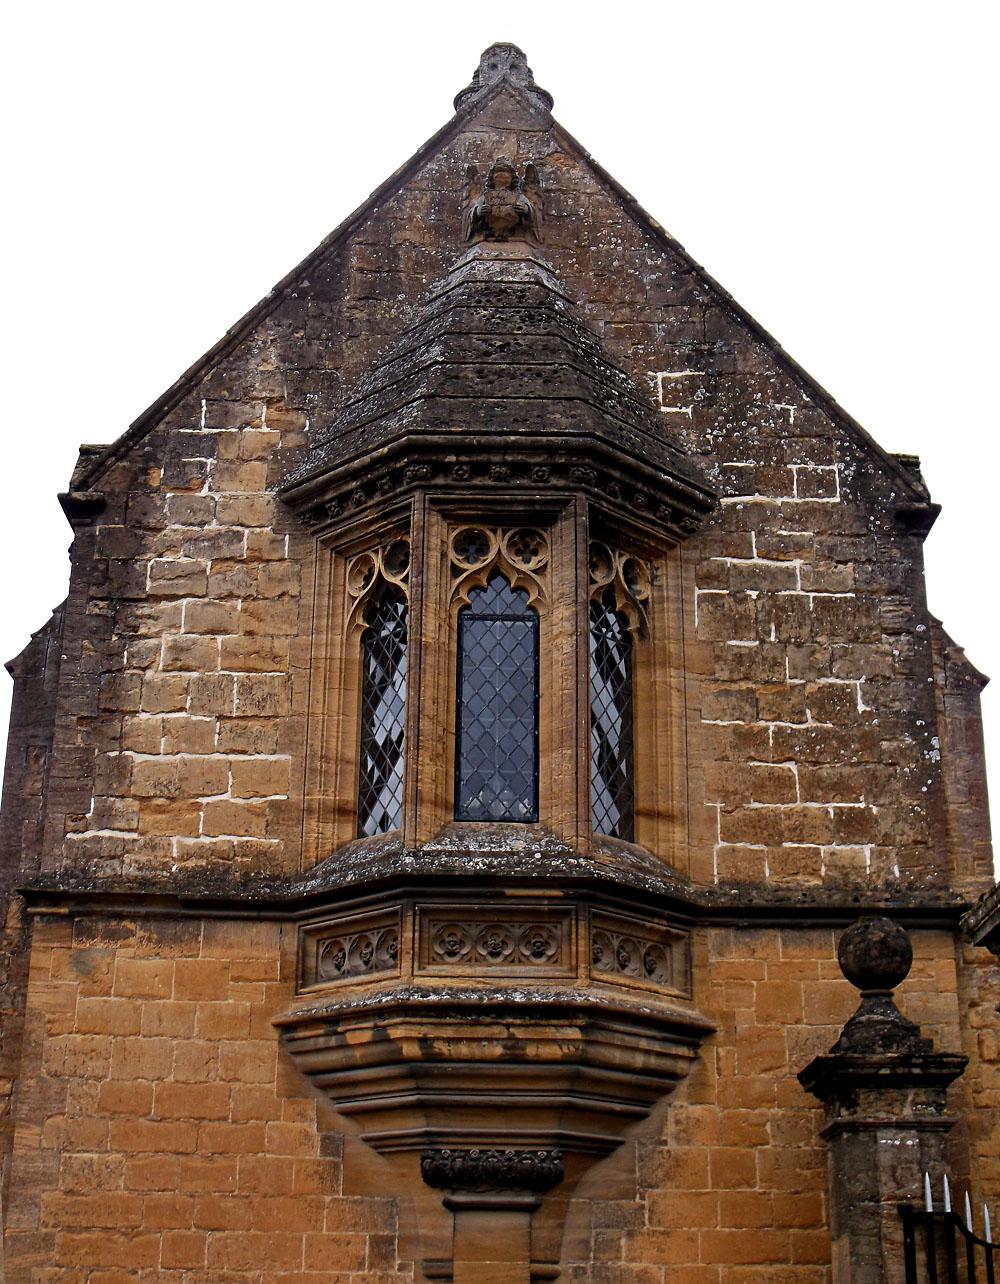 Bow Window by OghamMoon